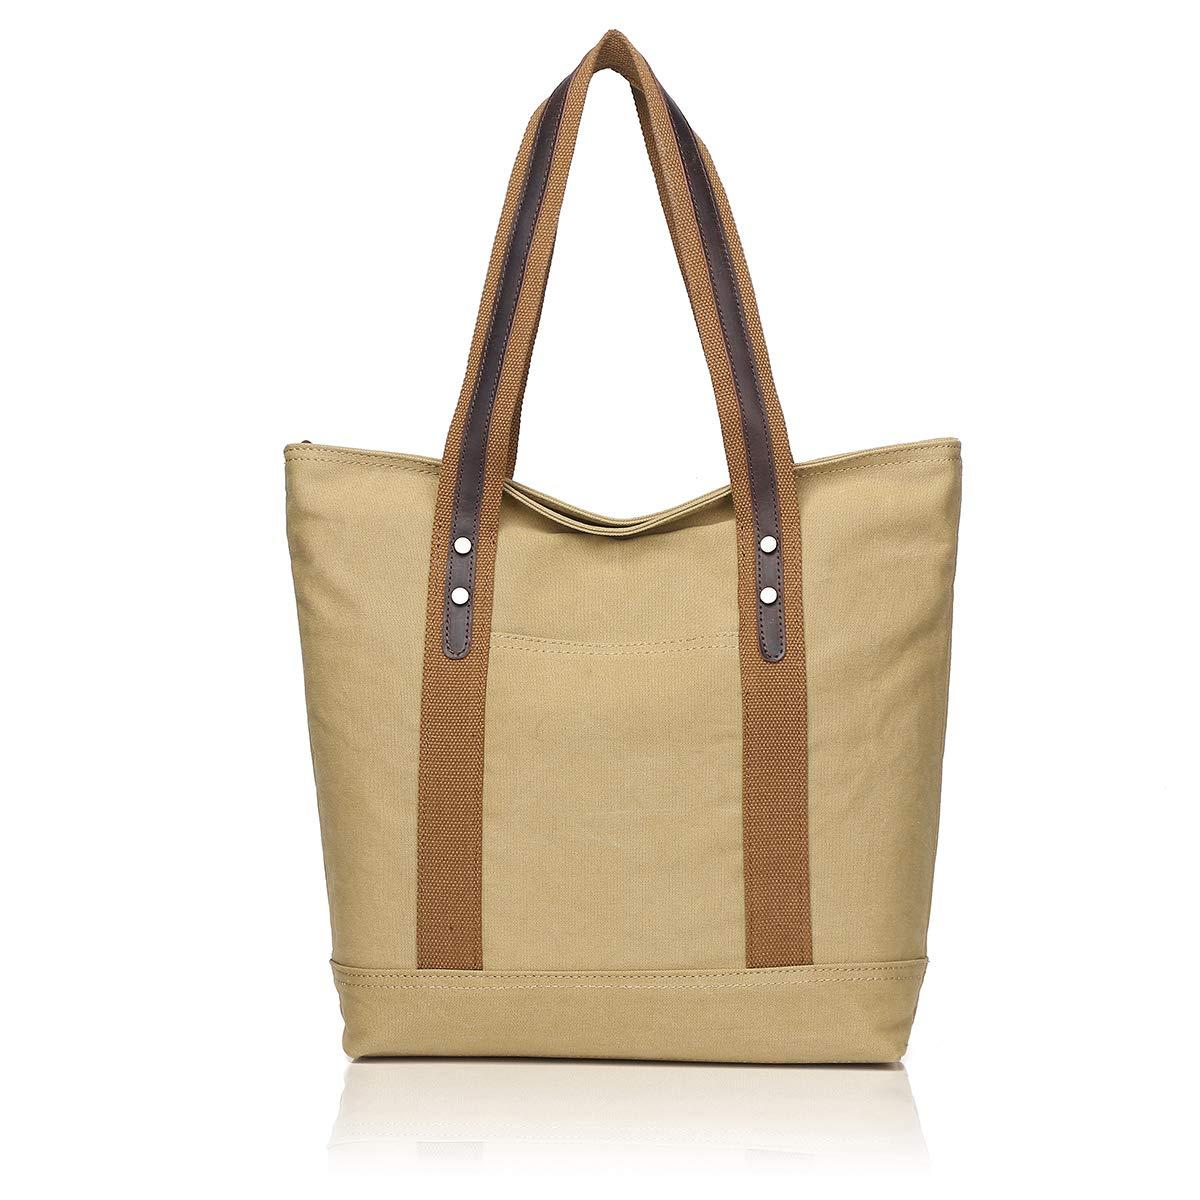 KHAKI APHISON Ladies Canvas Shoulder Bag Large Shopping Bag Waterproof Large Capacity2076